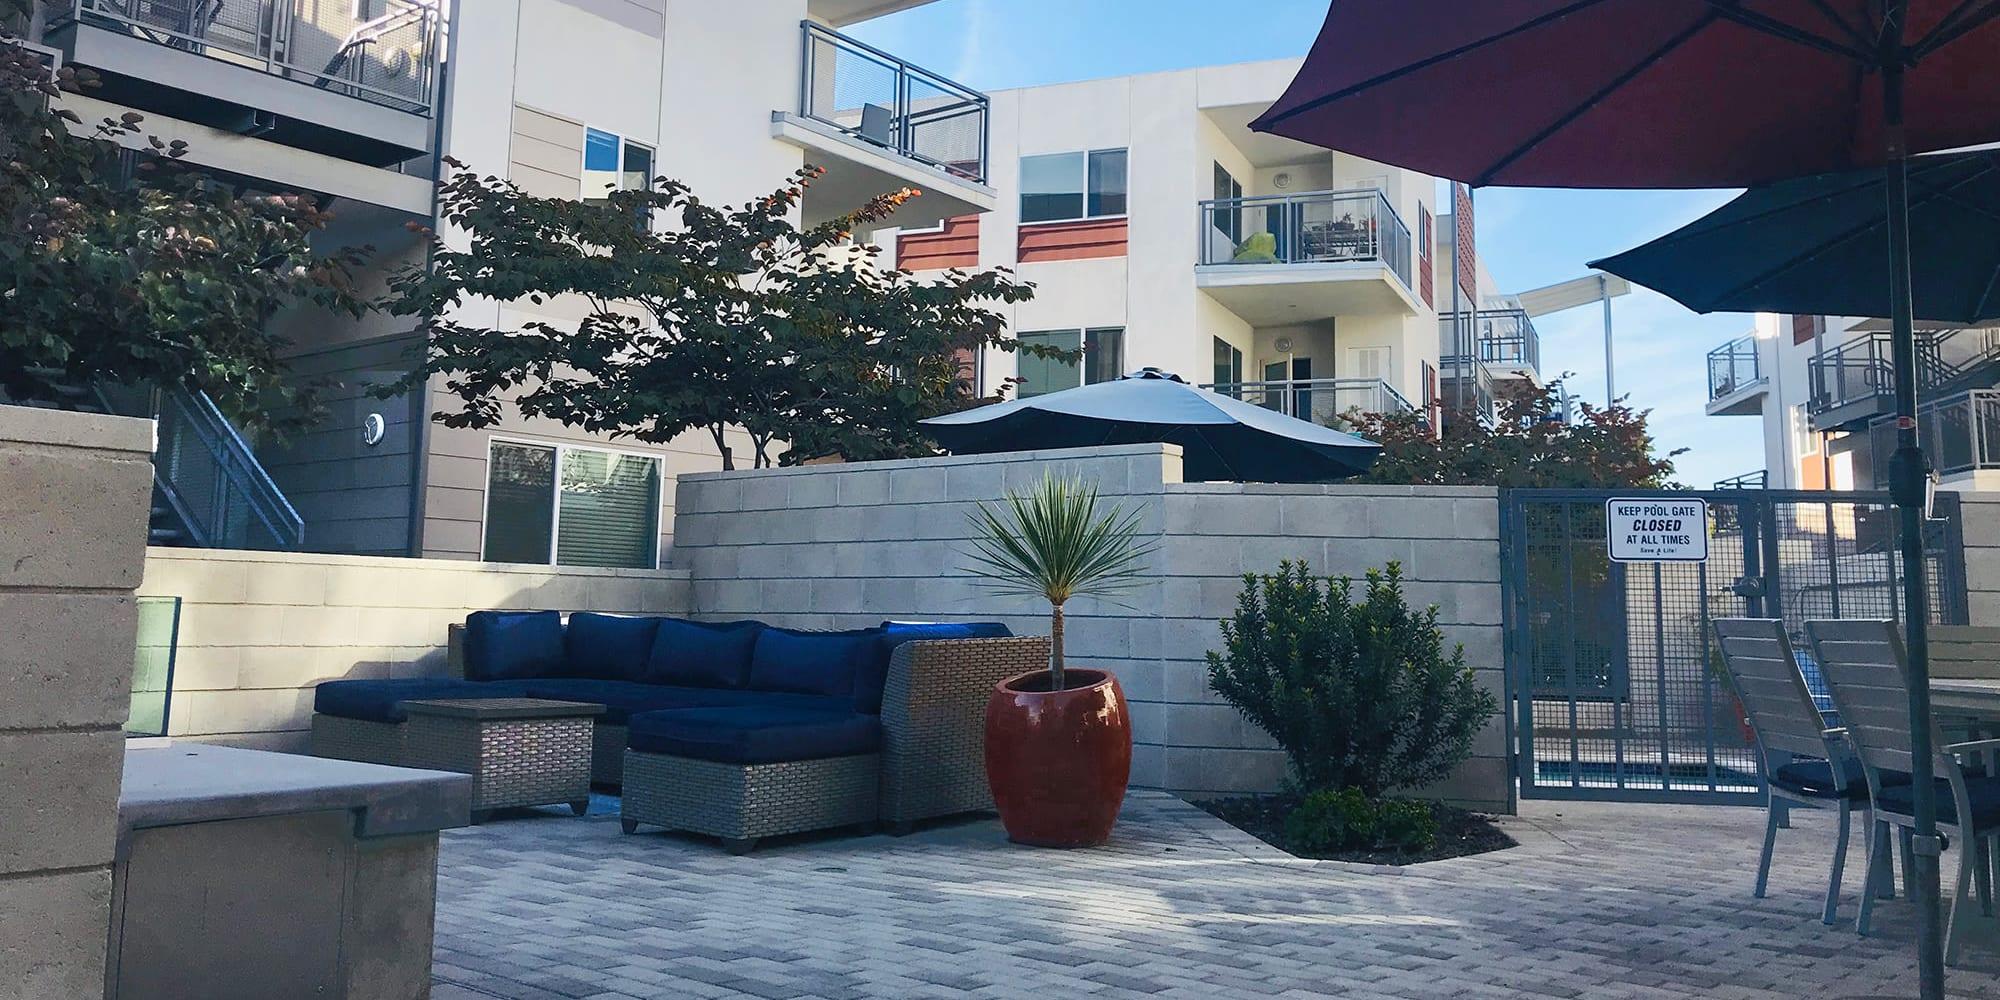 Umbrellas and mature trees providing shade at an outdoor lounge area at Citron in Ventura, California